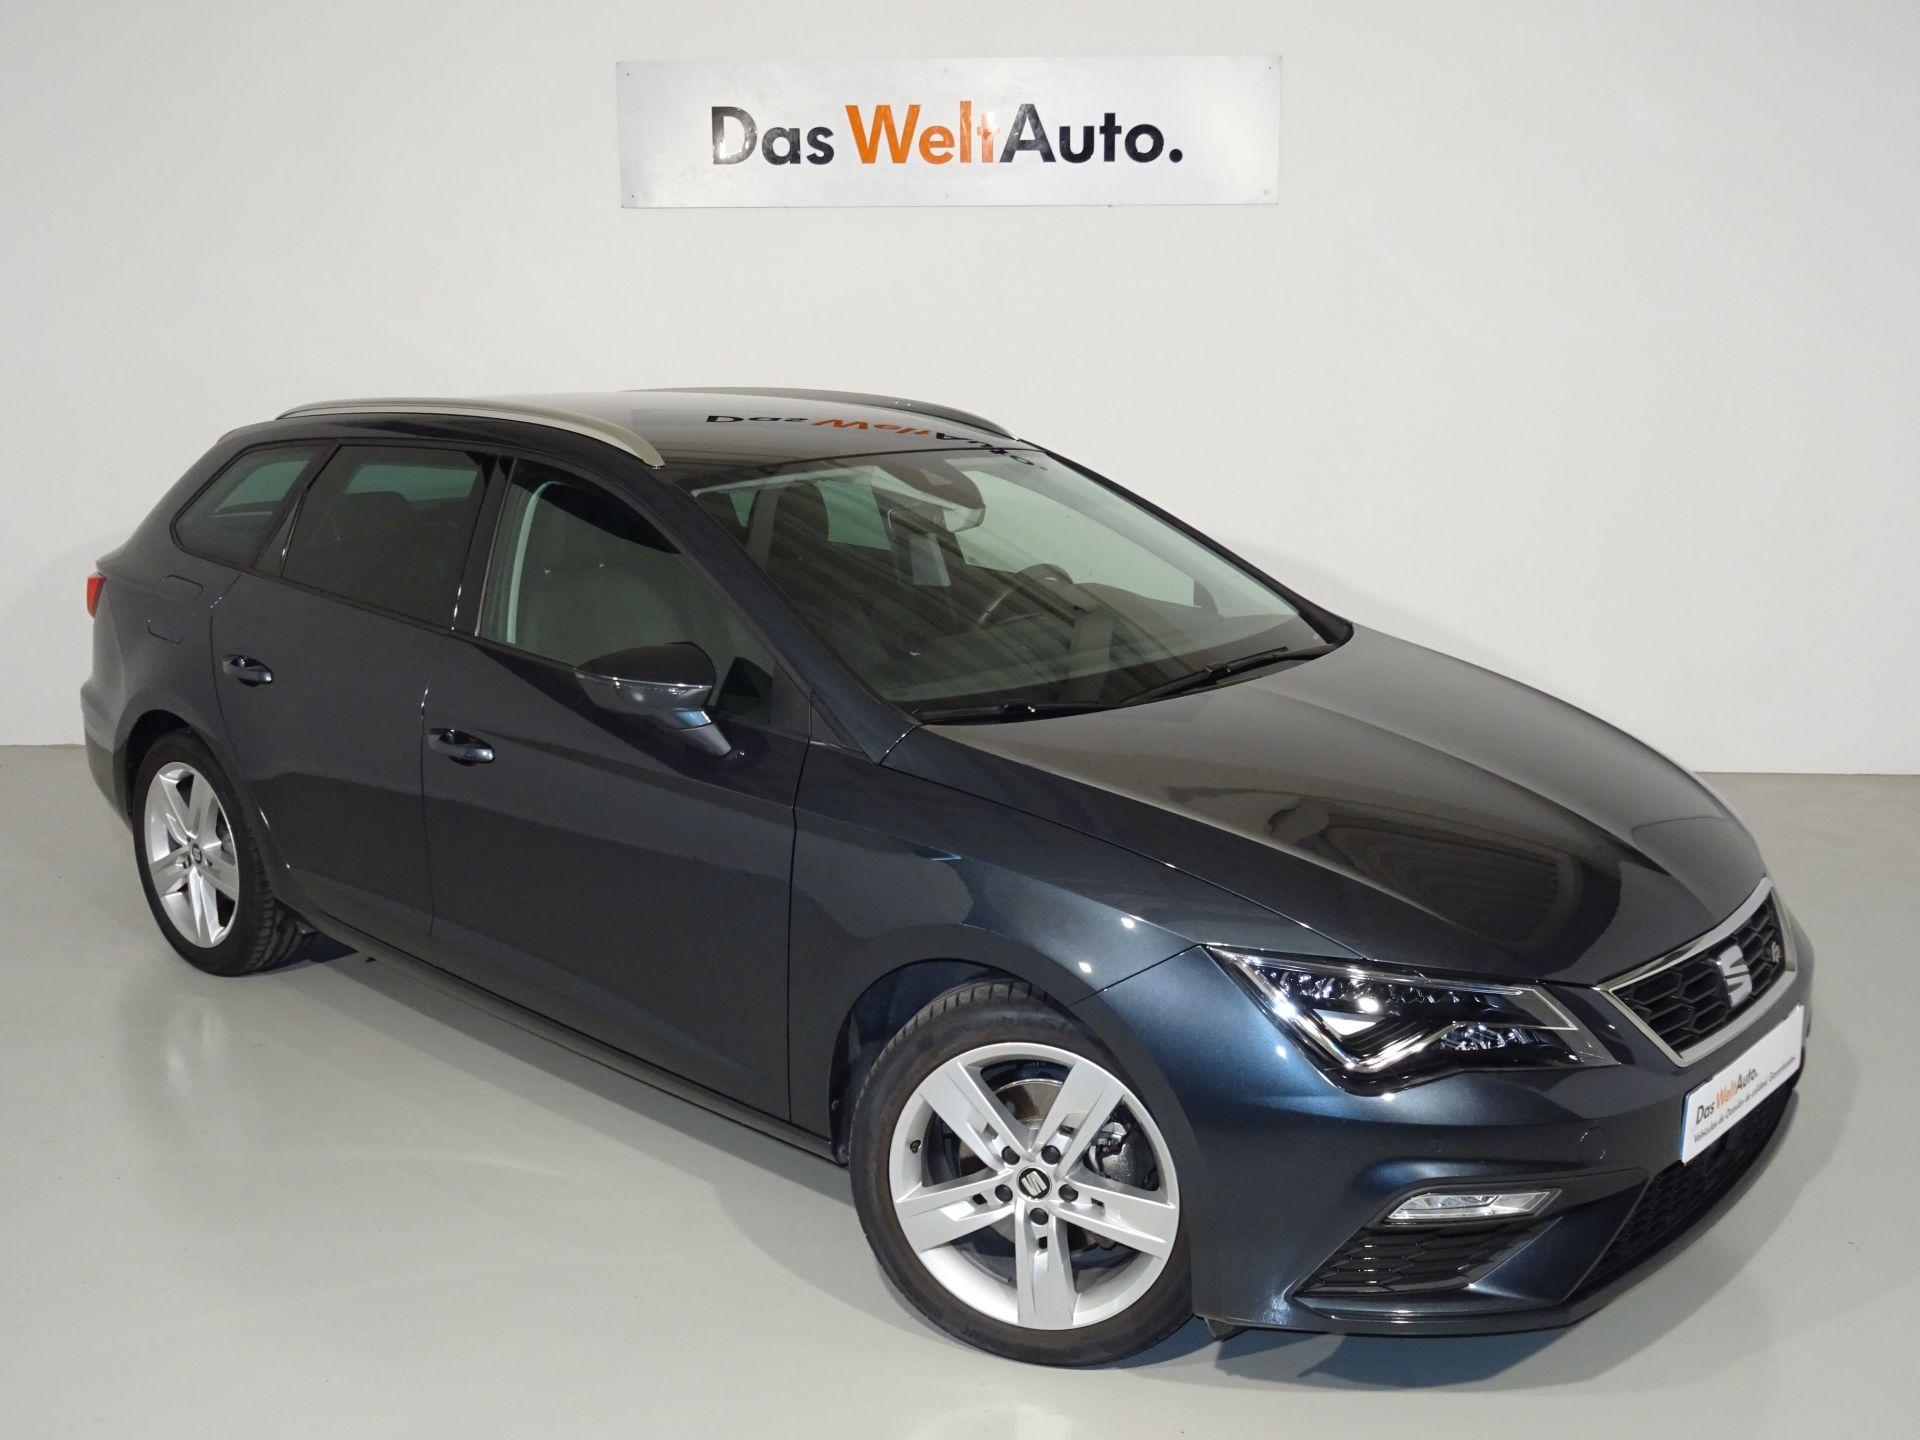 SEAT Leon ST 1.5 EcoTSI 110kW DSG-7 S&S FR Fast Ed